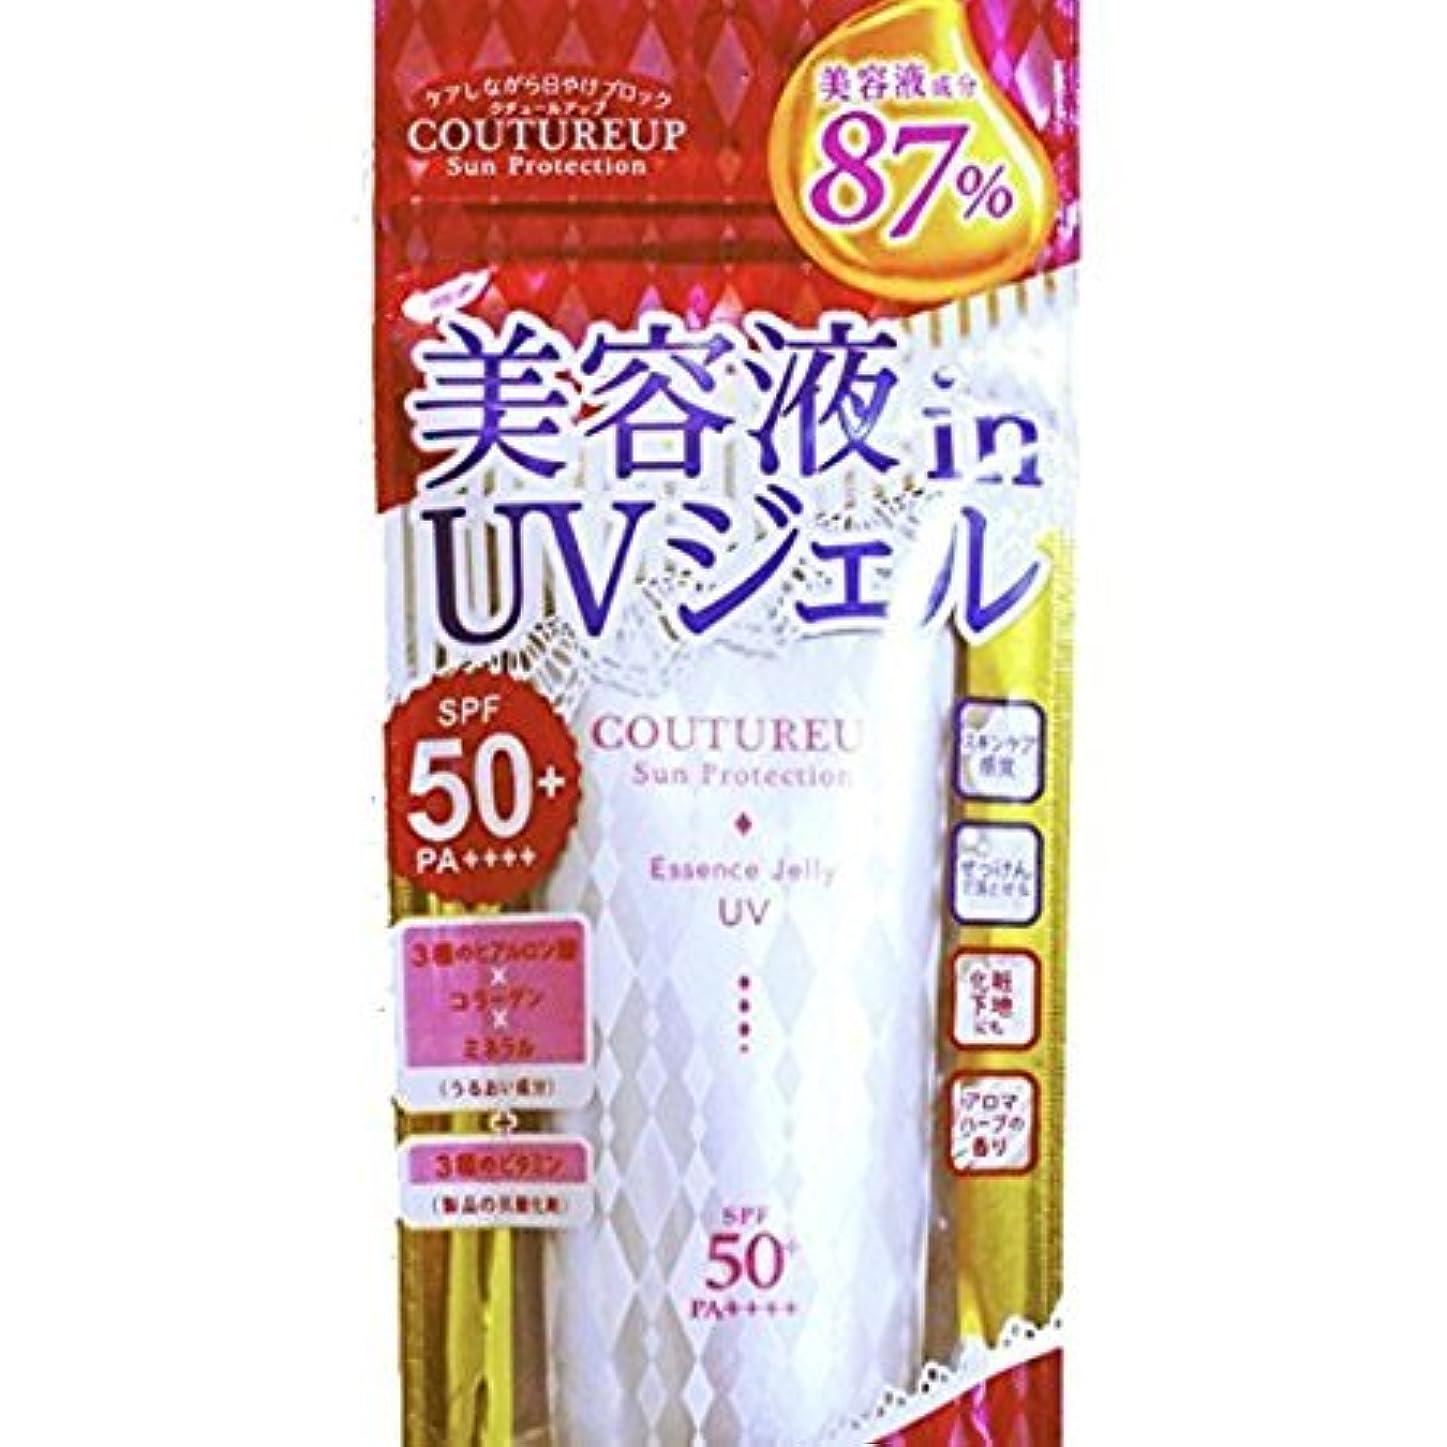 事故認証実現可能性美容液 in UVジェル SPF50+/PA++++ 65g 美容液成分87% 日焼け止め&化粧下地